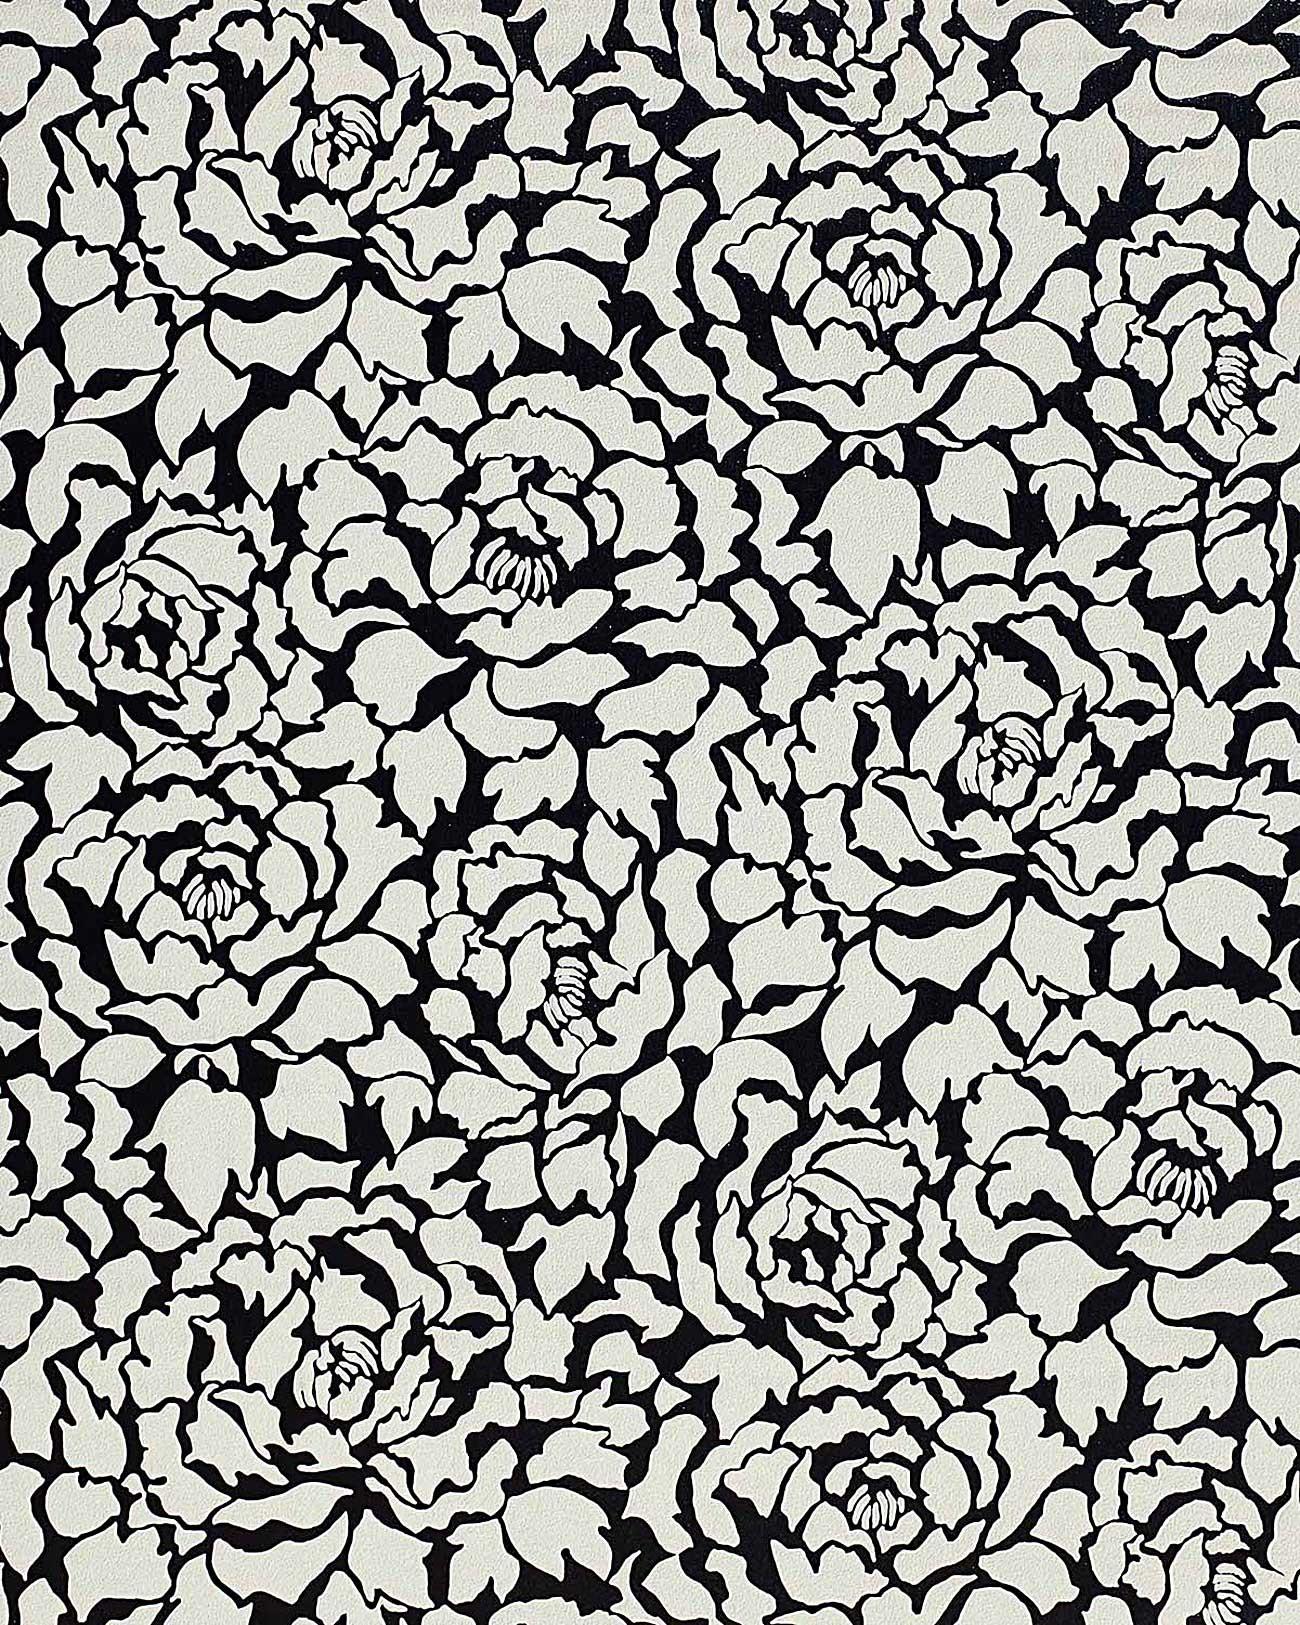 Zwart Wit Vinyl Keuken : Black and White Peony Flower